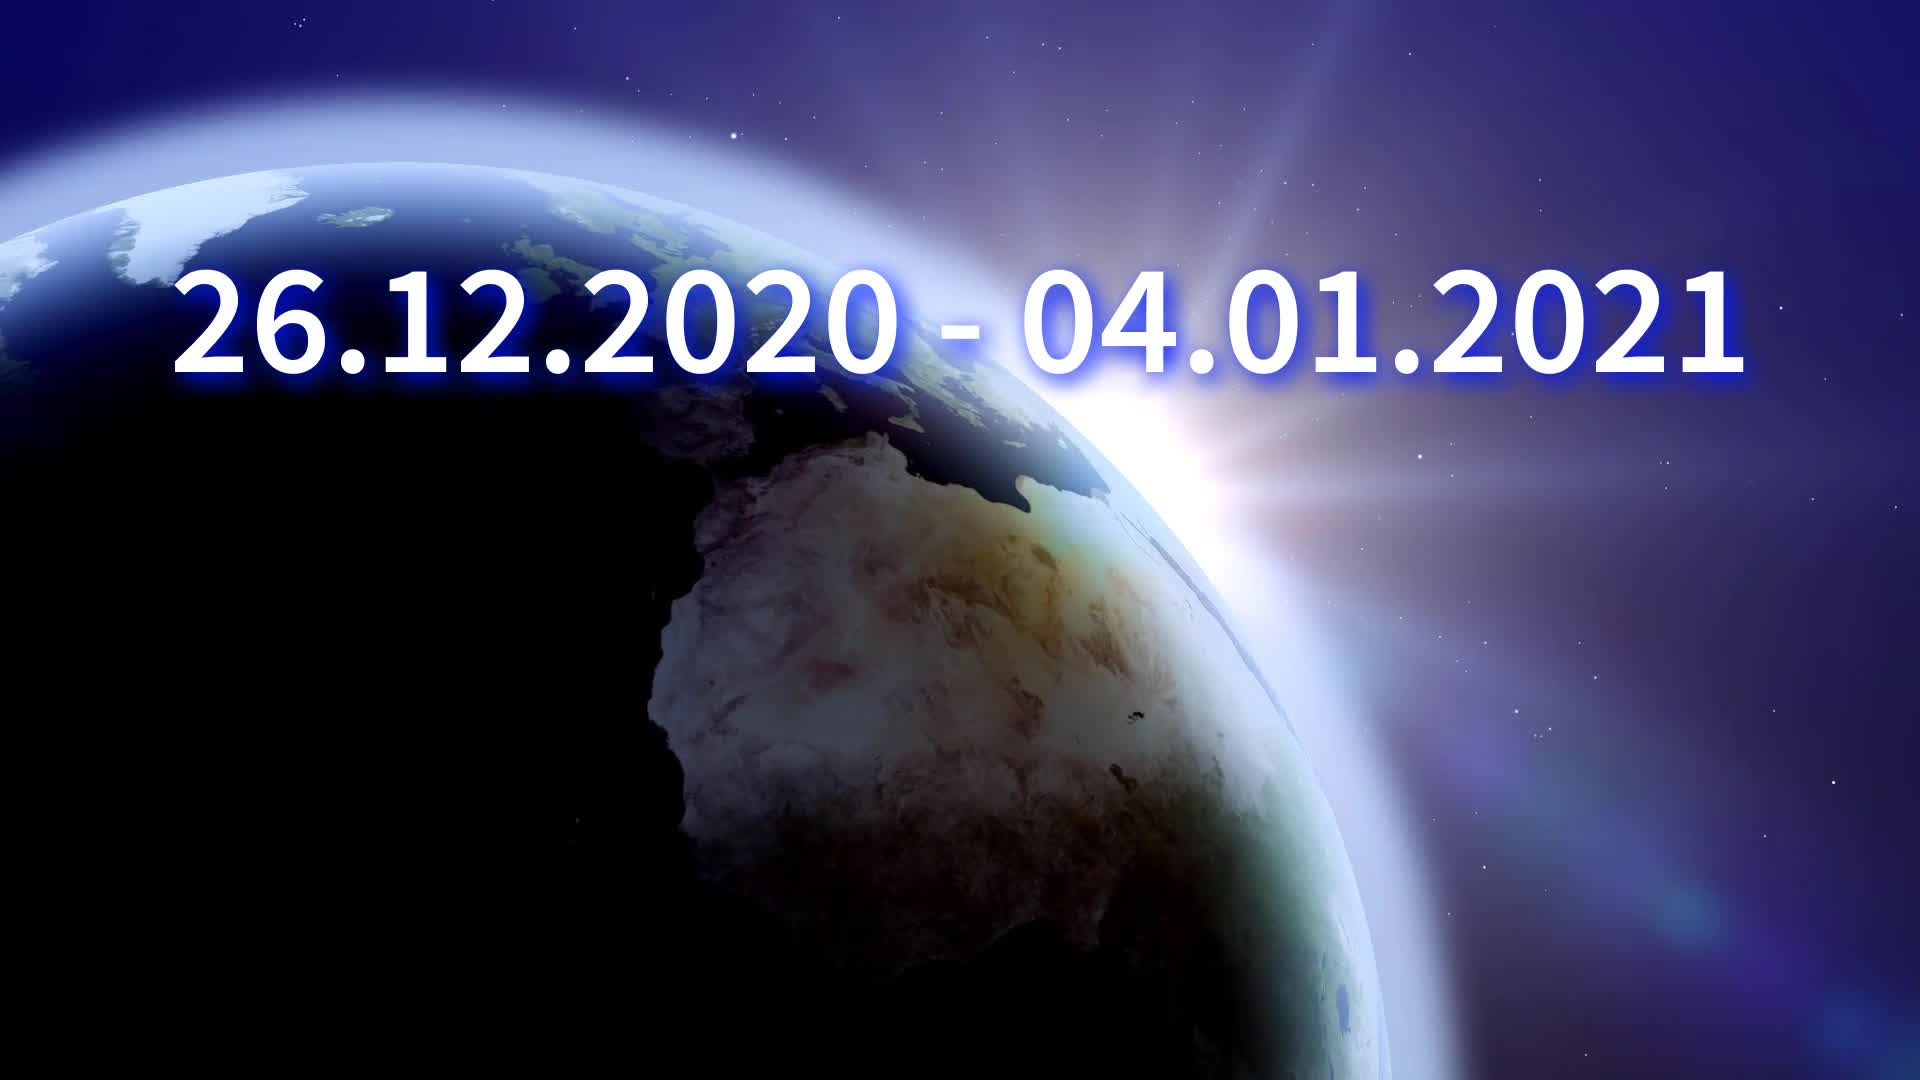 TheWorldBecomesONE Online Kongress 2020/21